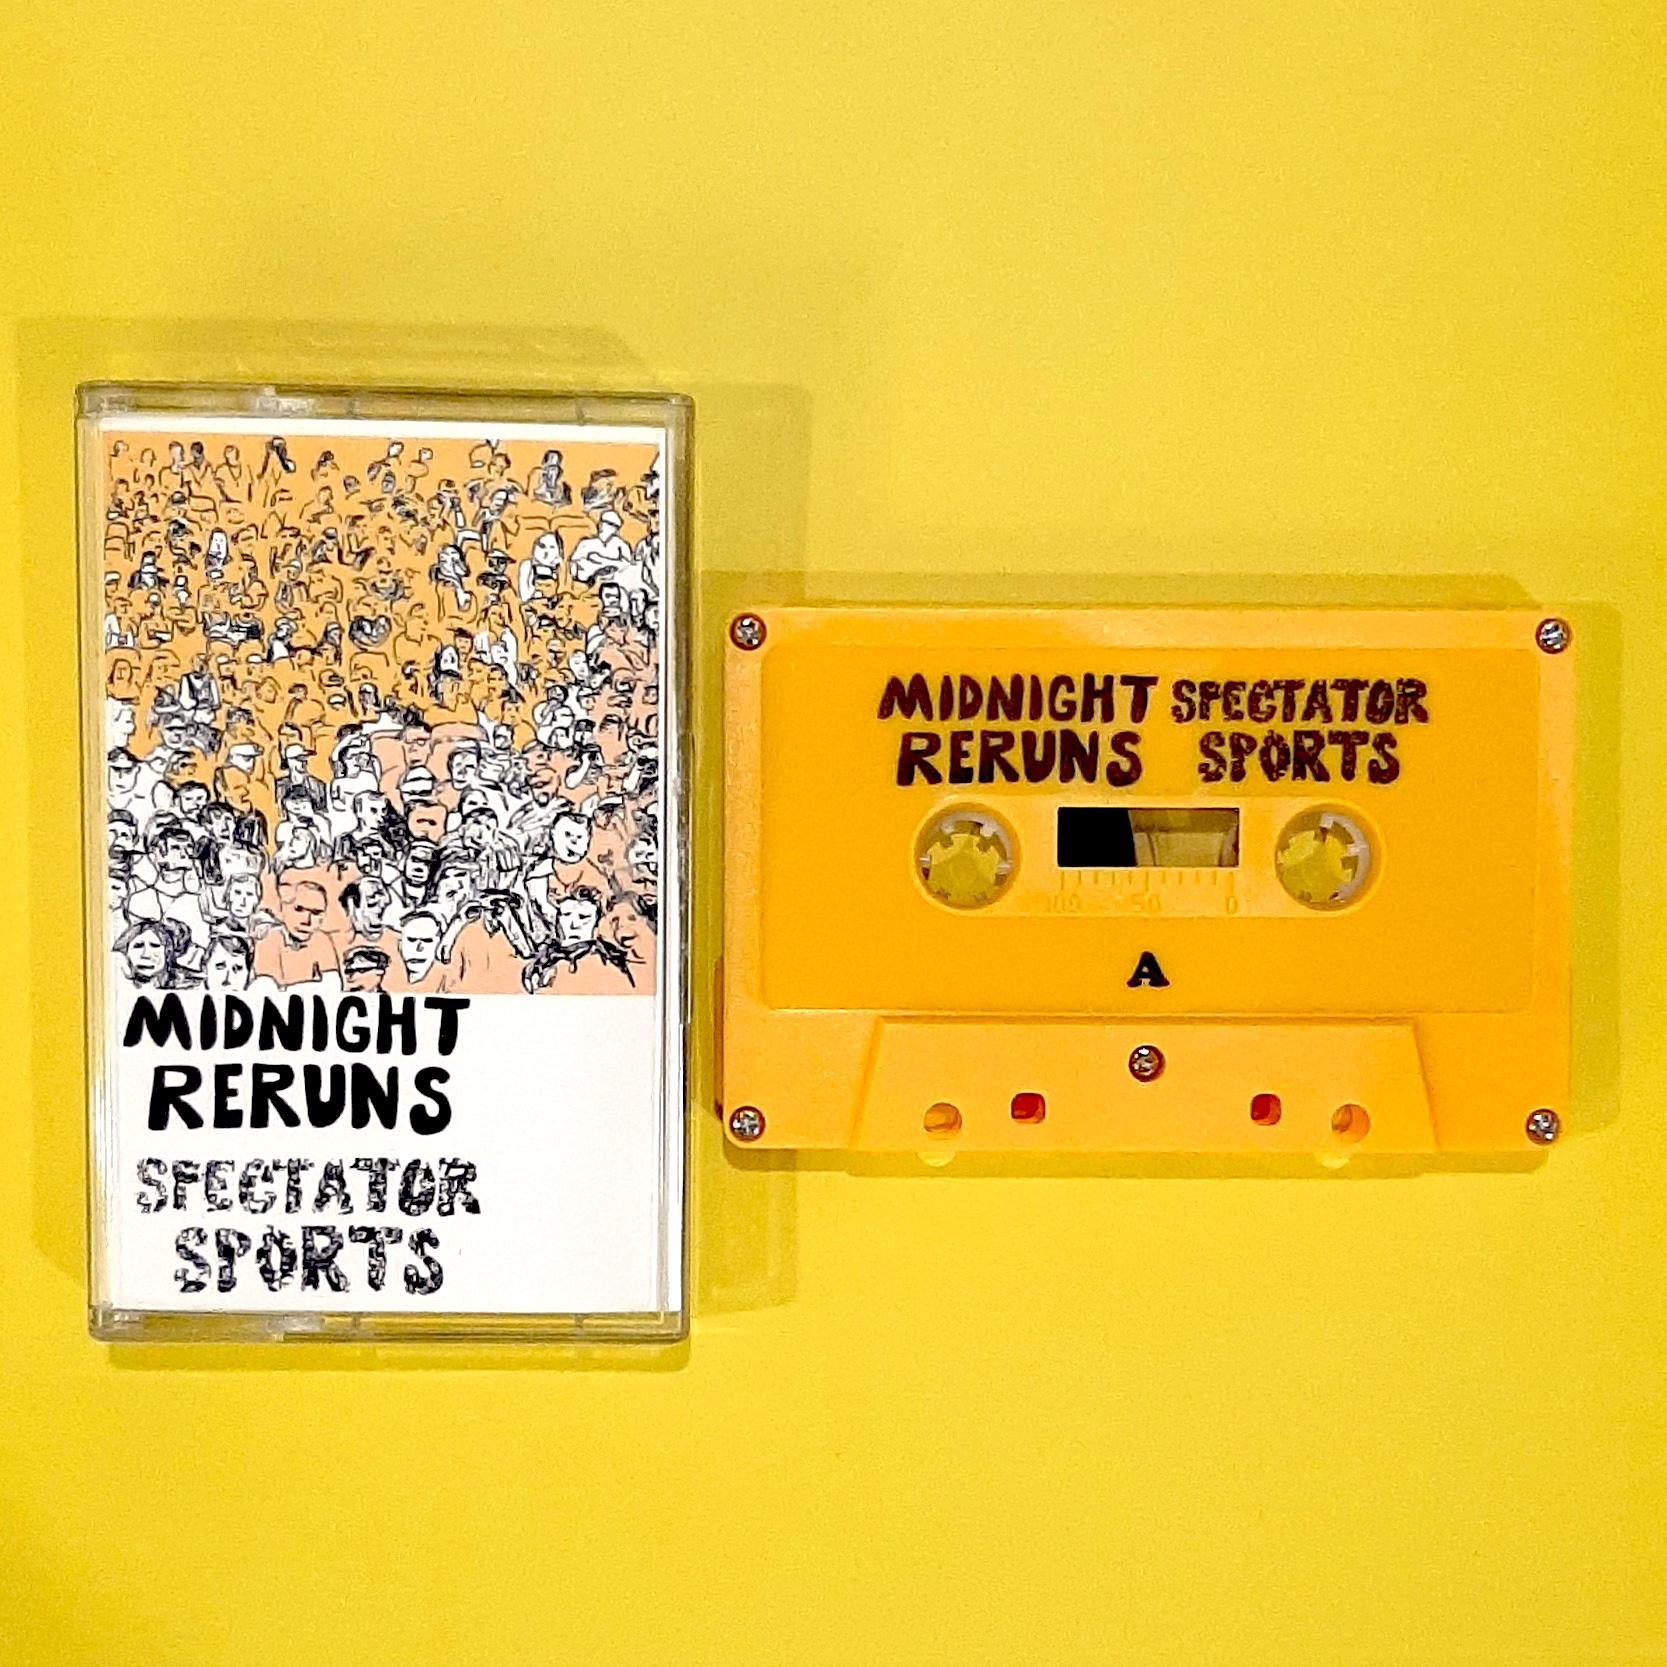 Midnight Reruns - Spectator Sports (Forged Artifacts)